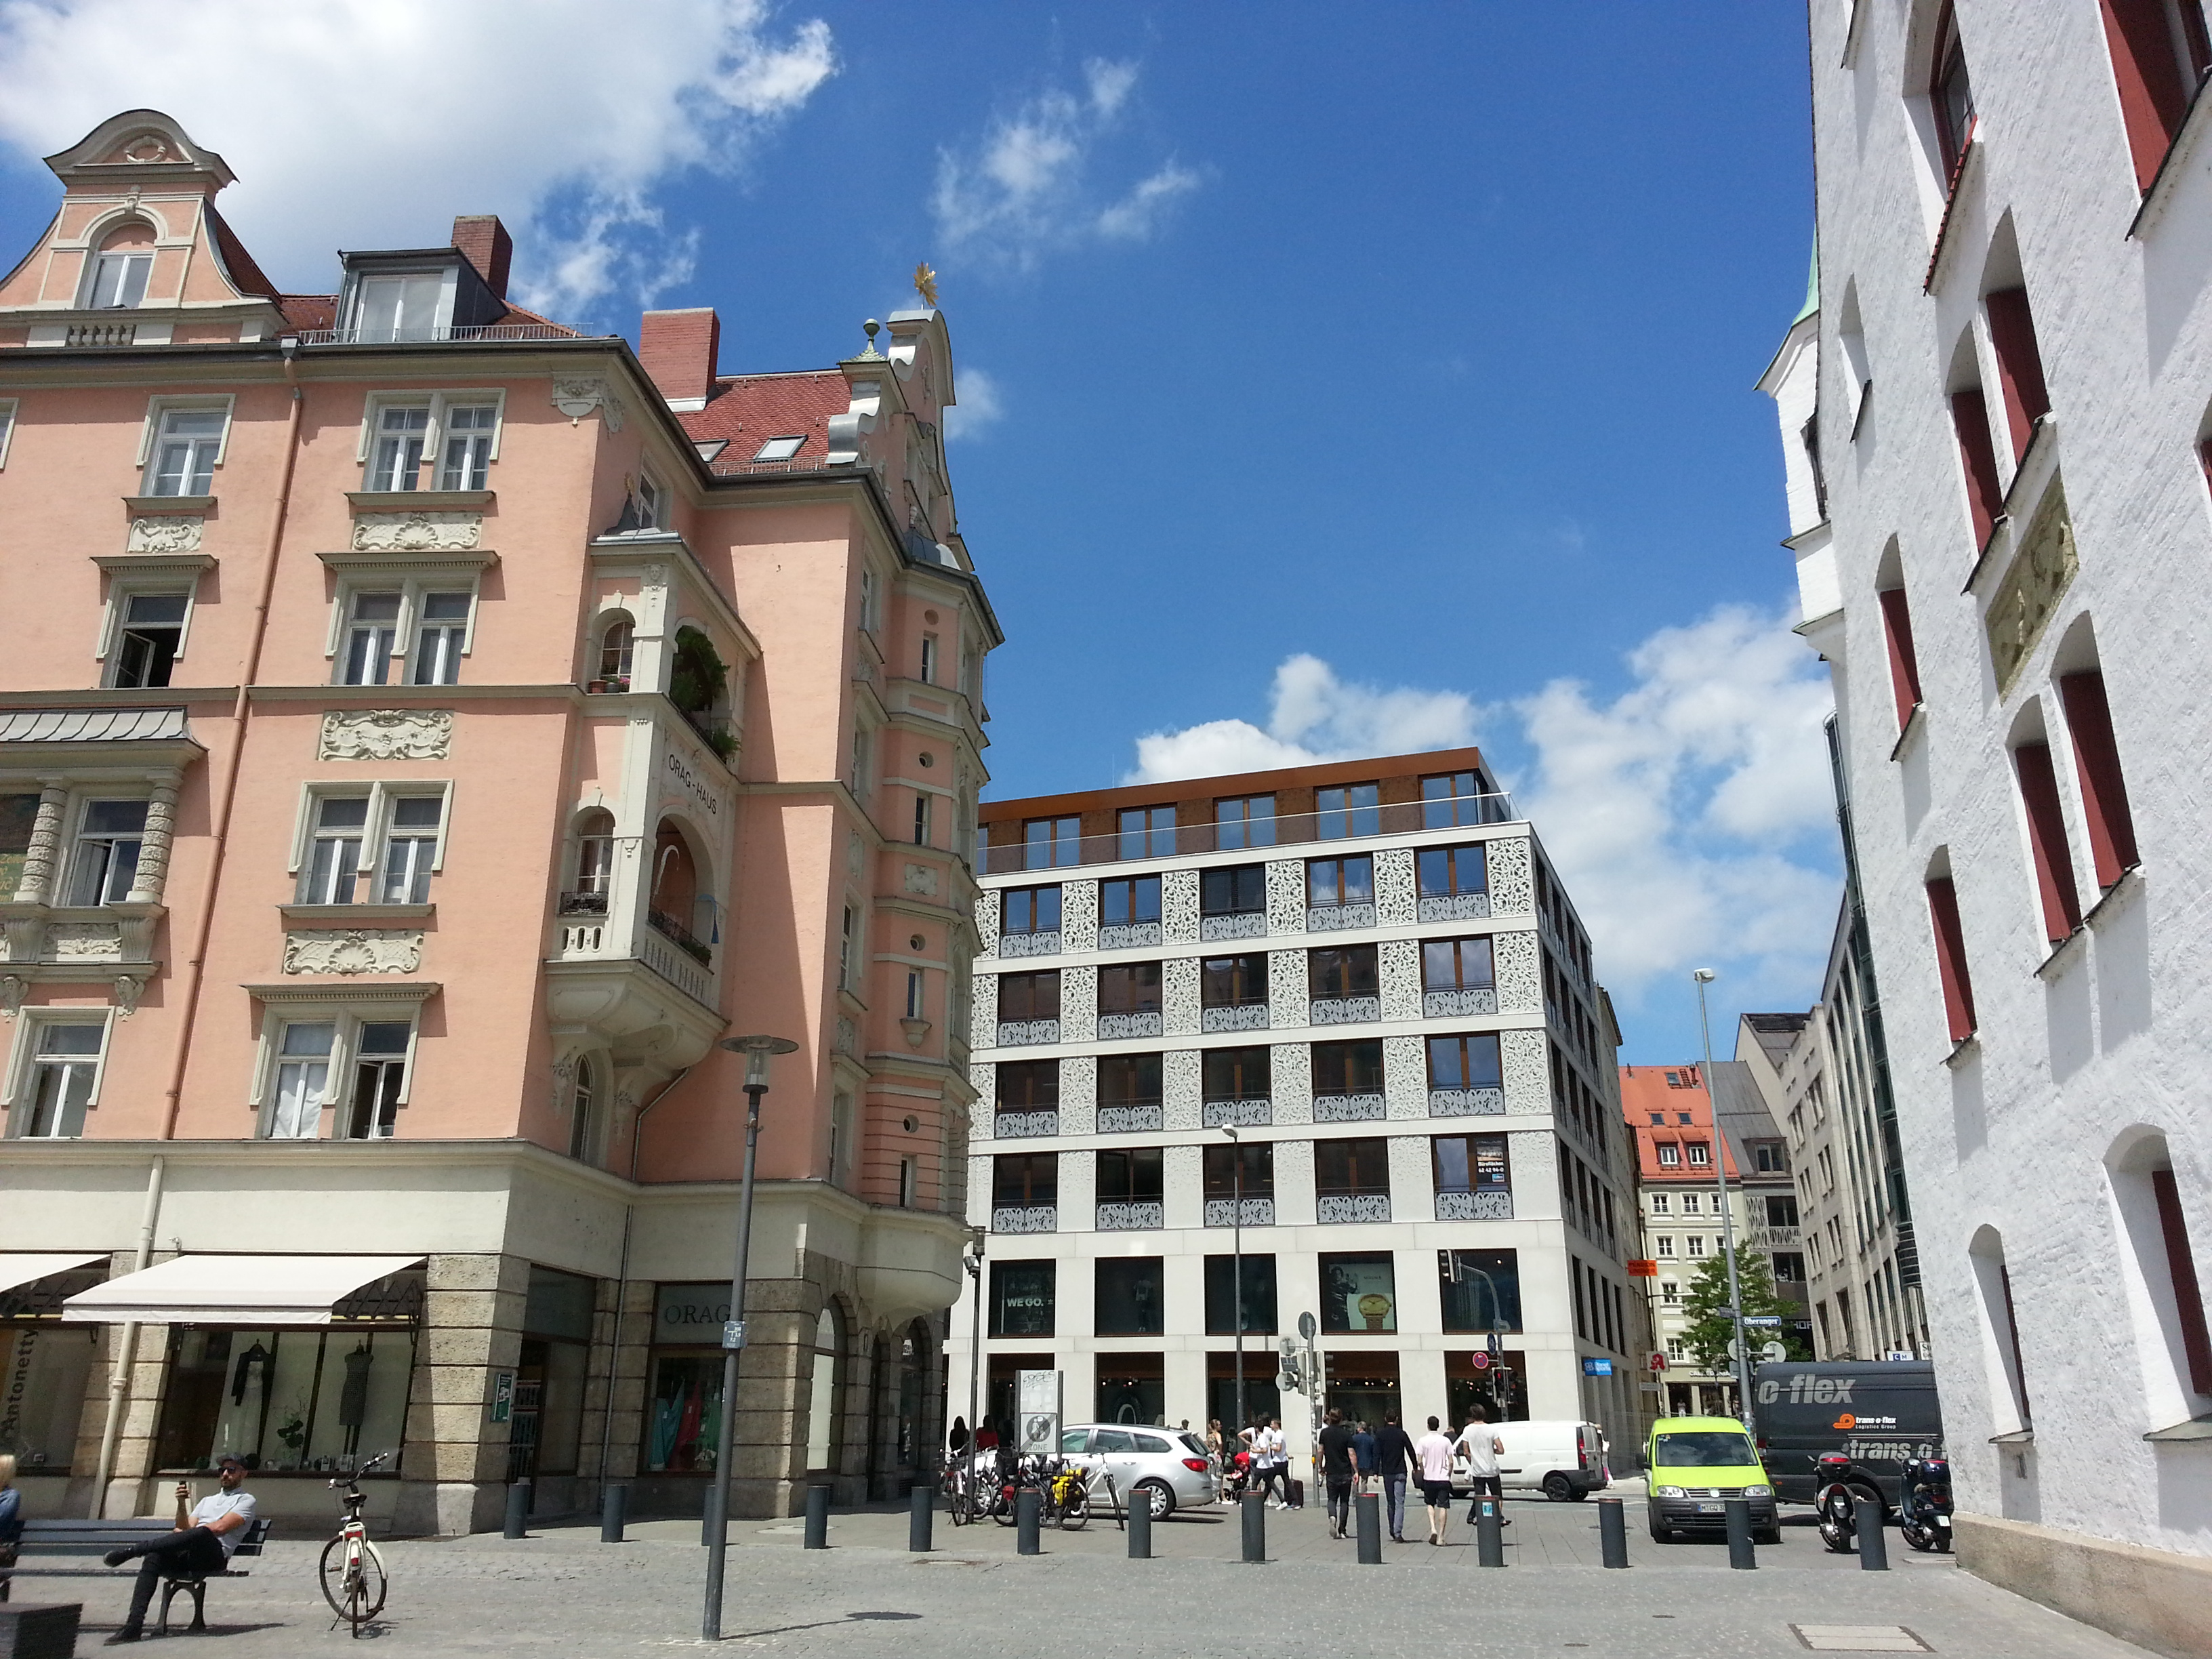 München - Altstadt - Page 4 - BY / Reg.bez. Oberbayern ...